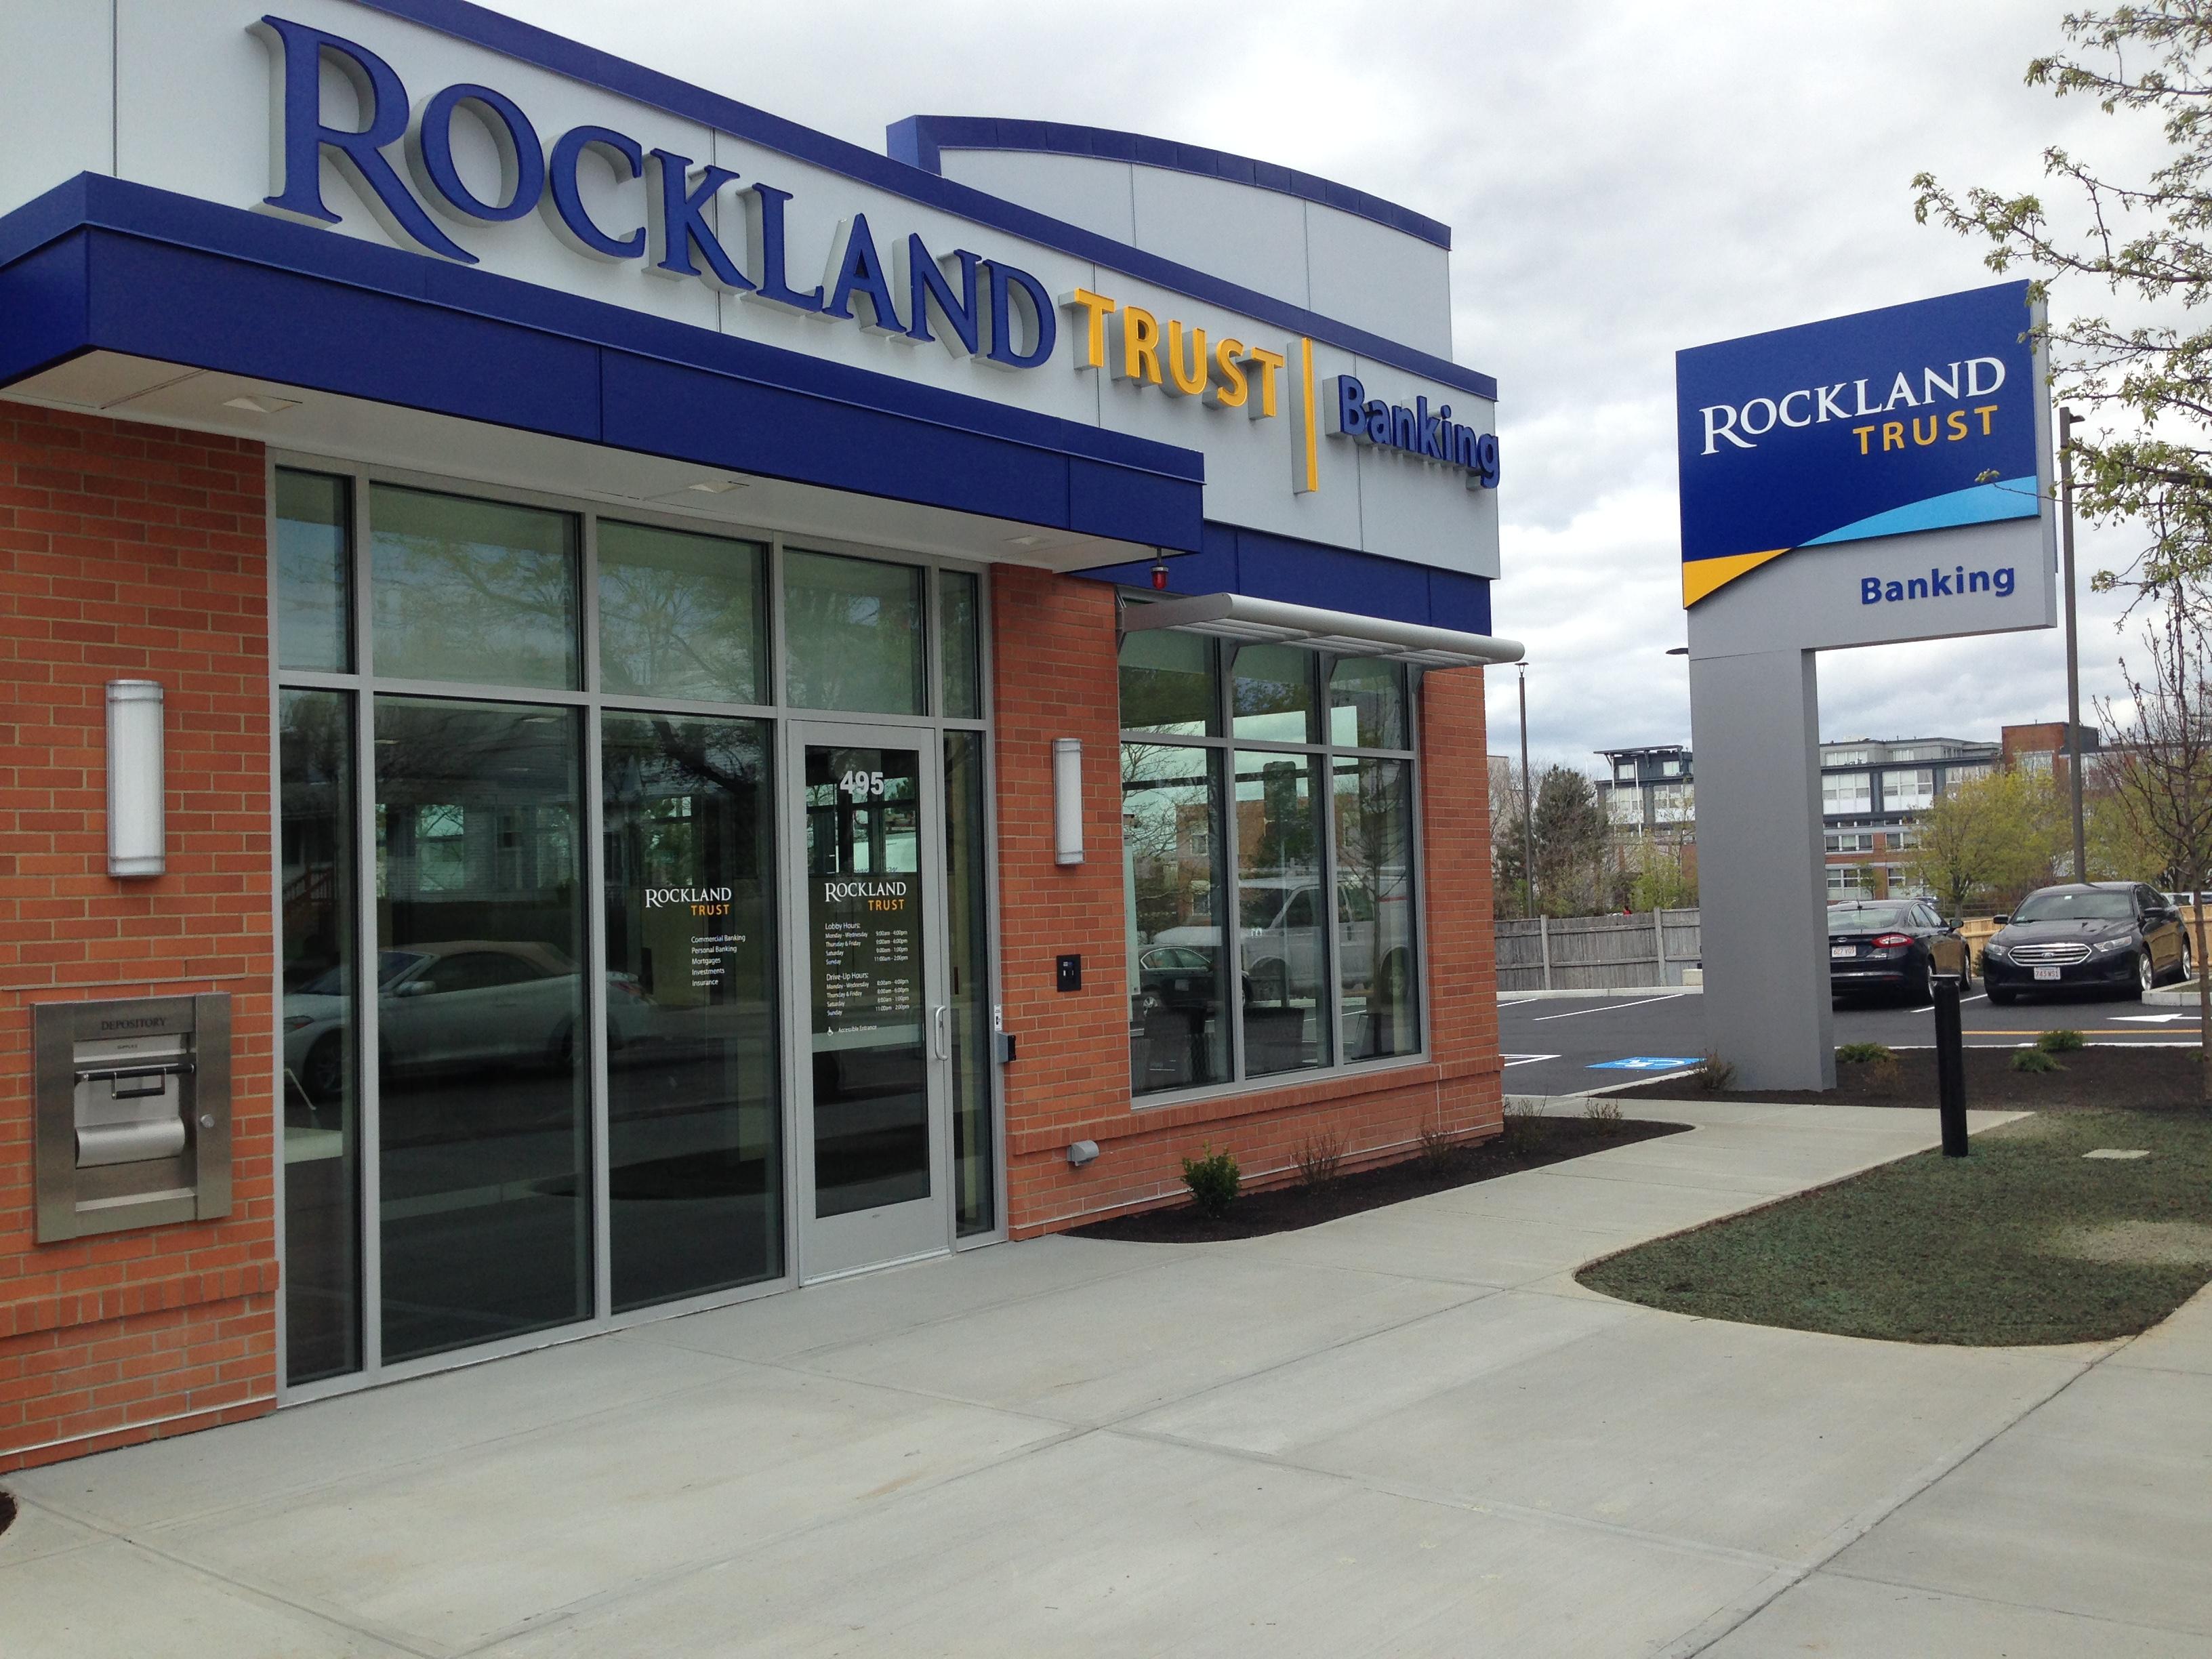 Image of Rockland Trust Renovation